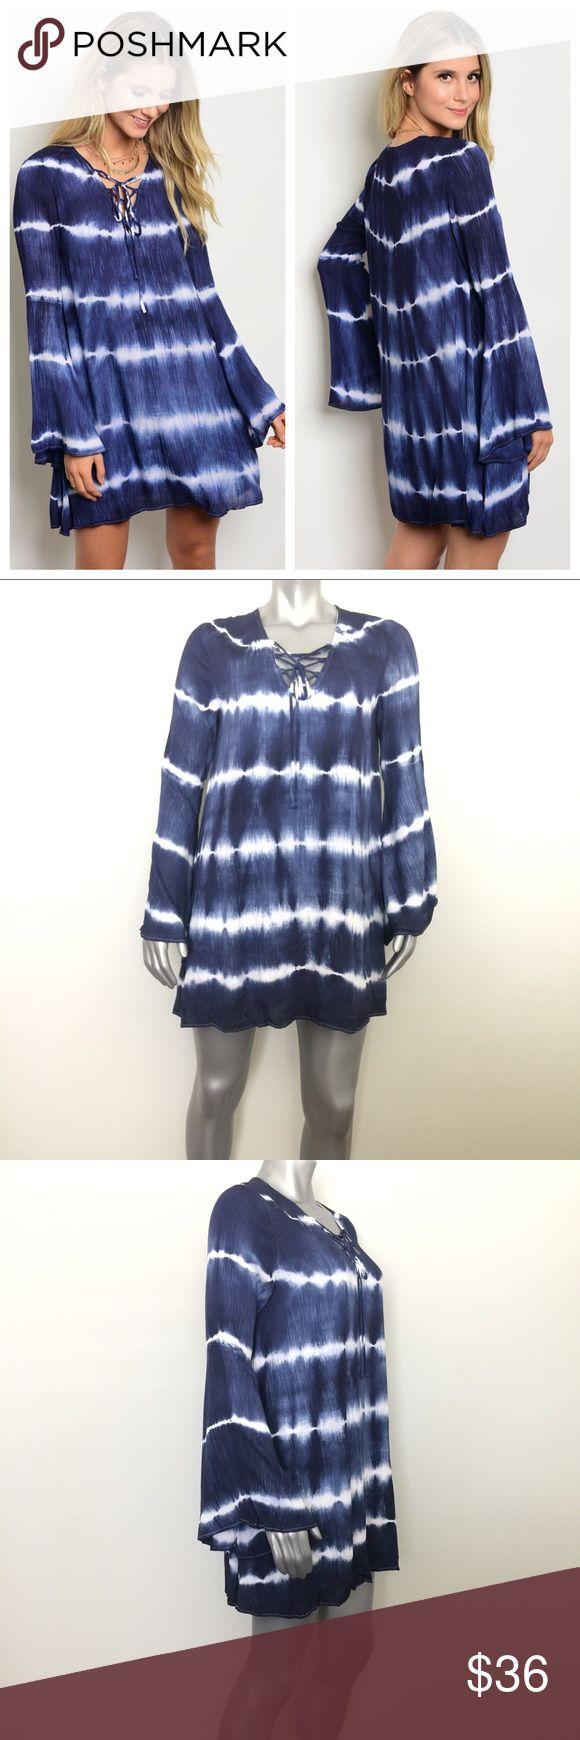 "Tie Dye Boho Bell Sleeve Mini Dress Trendy bell sleeve tie dye mini dress. Fully lined. 55% linen, 45% rayon. Length: 33"" (S, M, L) Bust: 40"" (S), 41"" (M), 44"" (L) Dresses Mini"